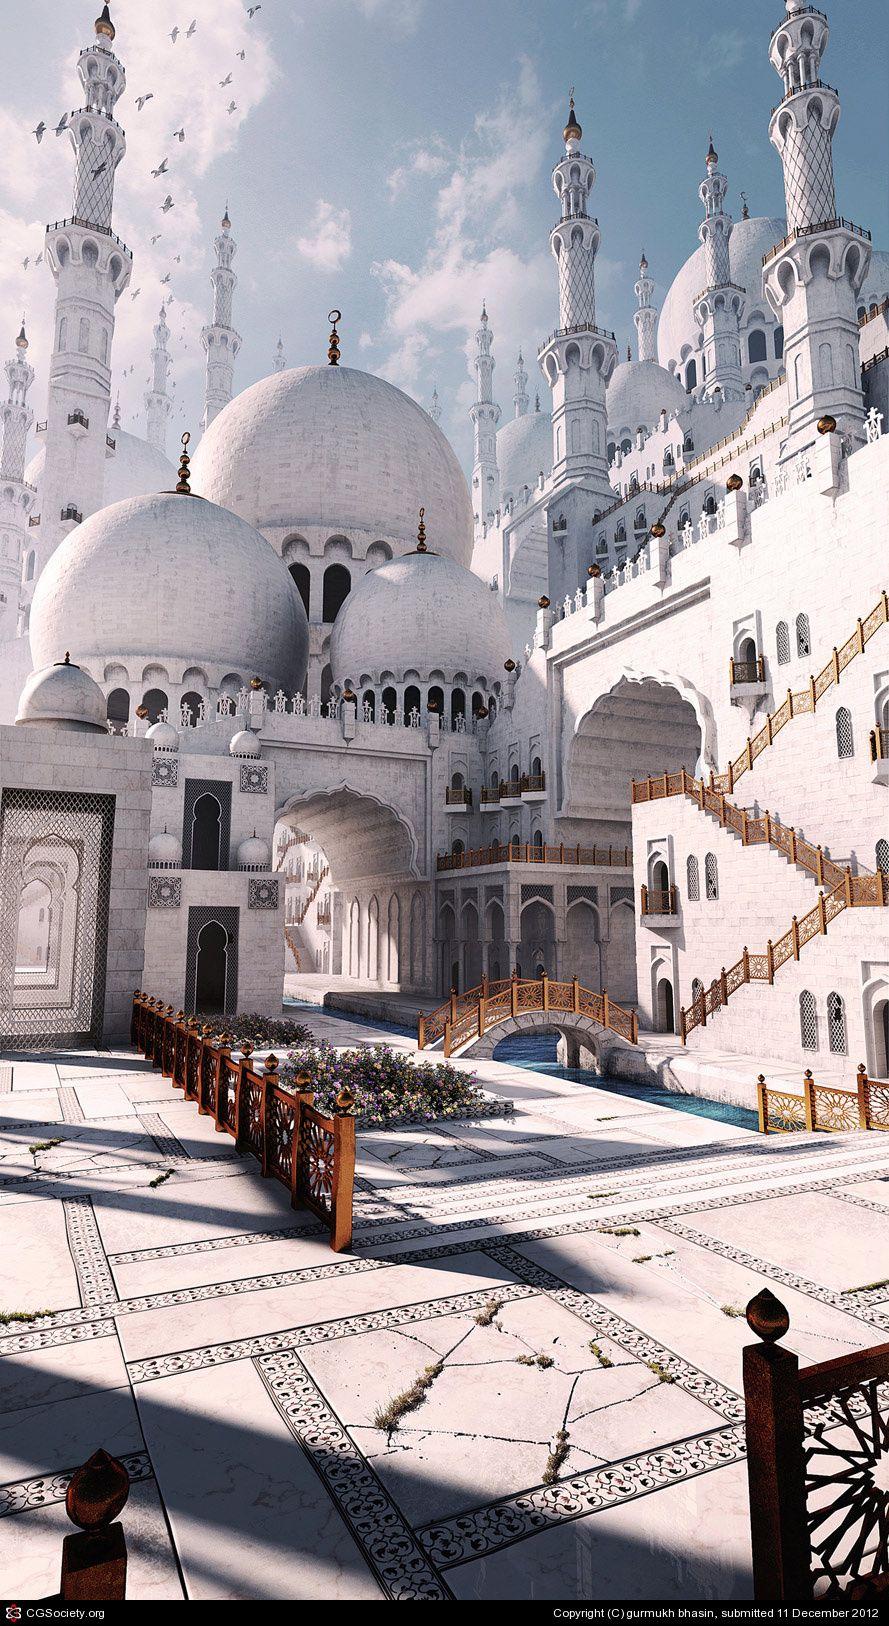 Mosque Updated by gurmukh bhasin   3D   Beautiful places to visit, Places  to travel, Places to visit